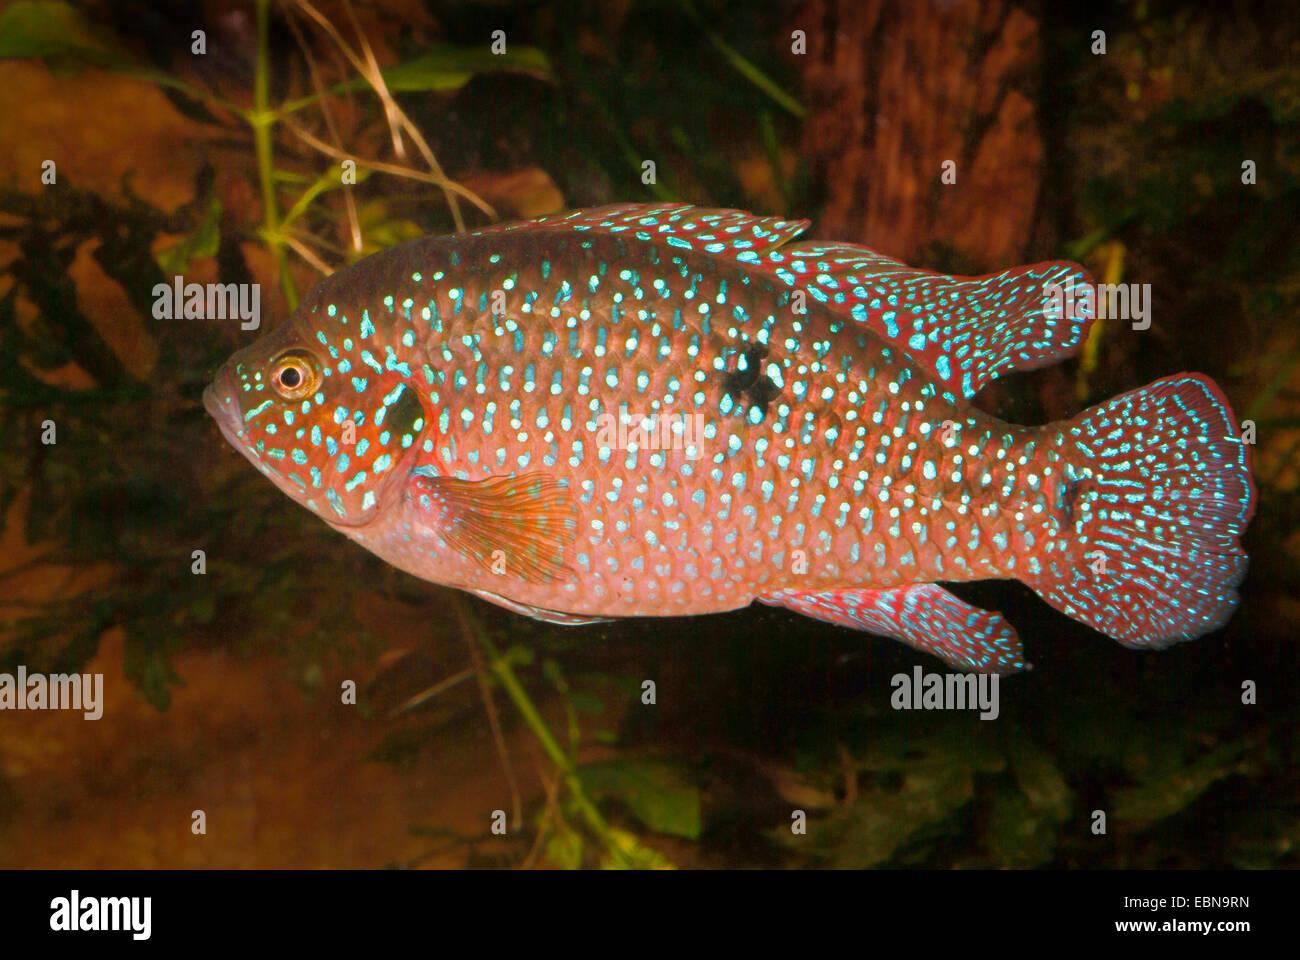 Freshwater jewel fish -  Jewel Fish Jewelfish Red Jewel Fish Red Cichlid Banded Jewel Fish